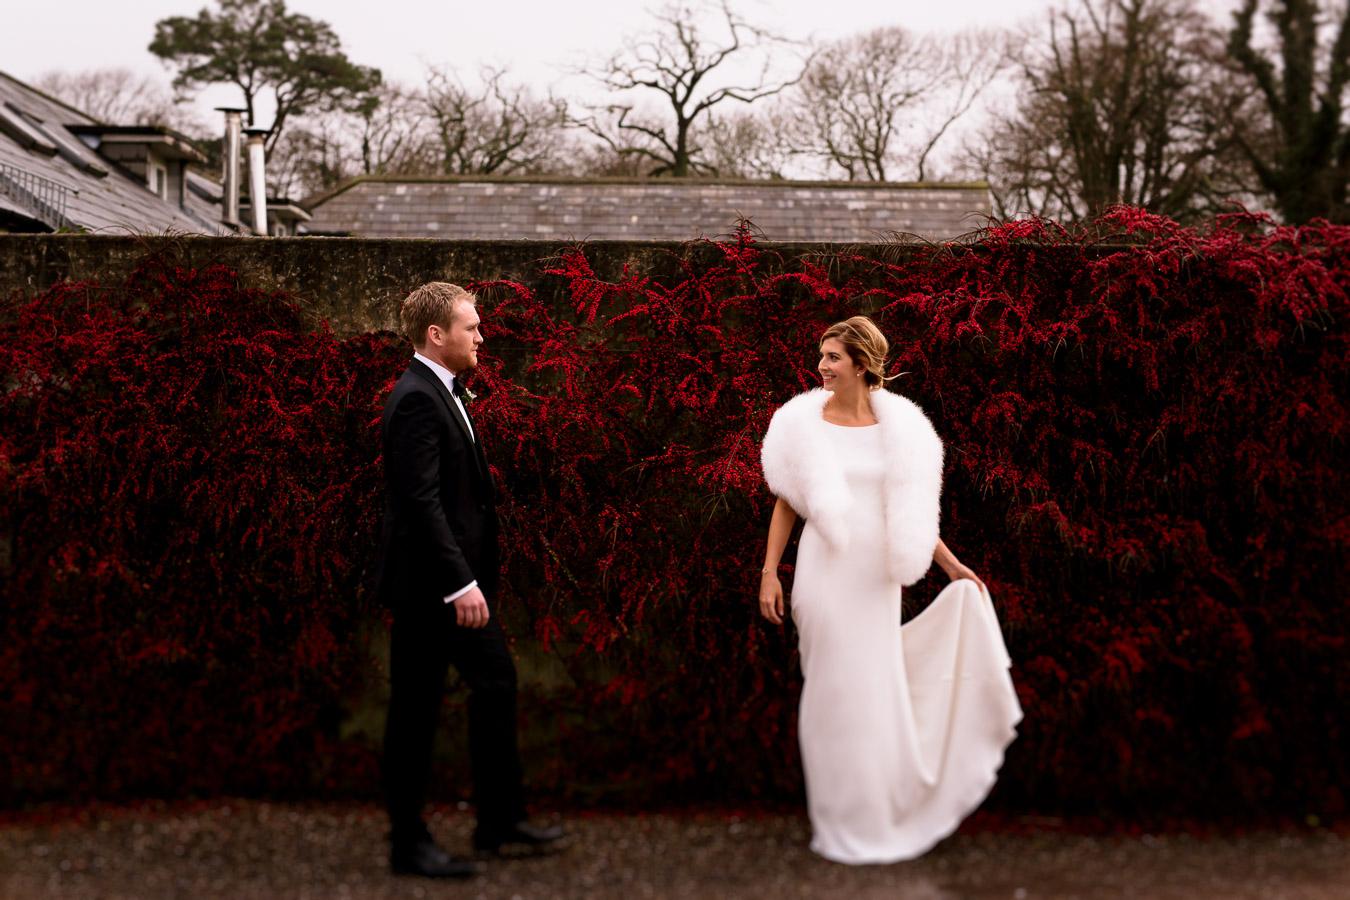 red holly wedding